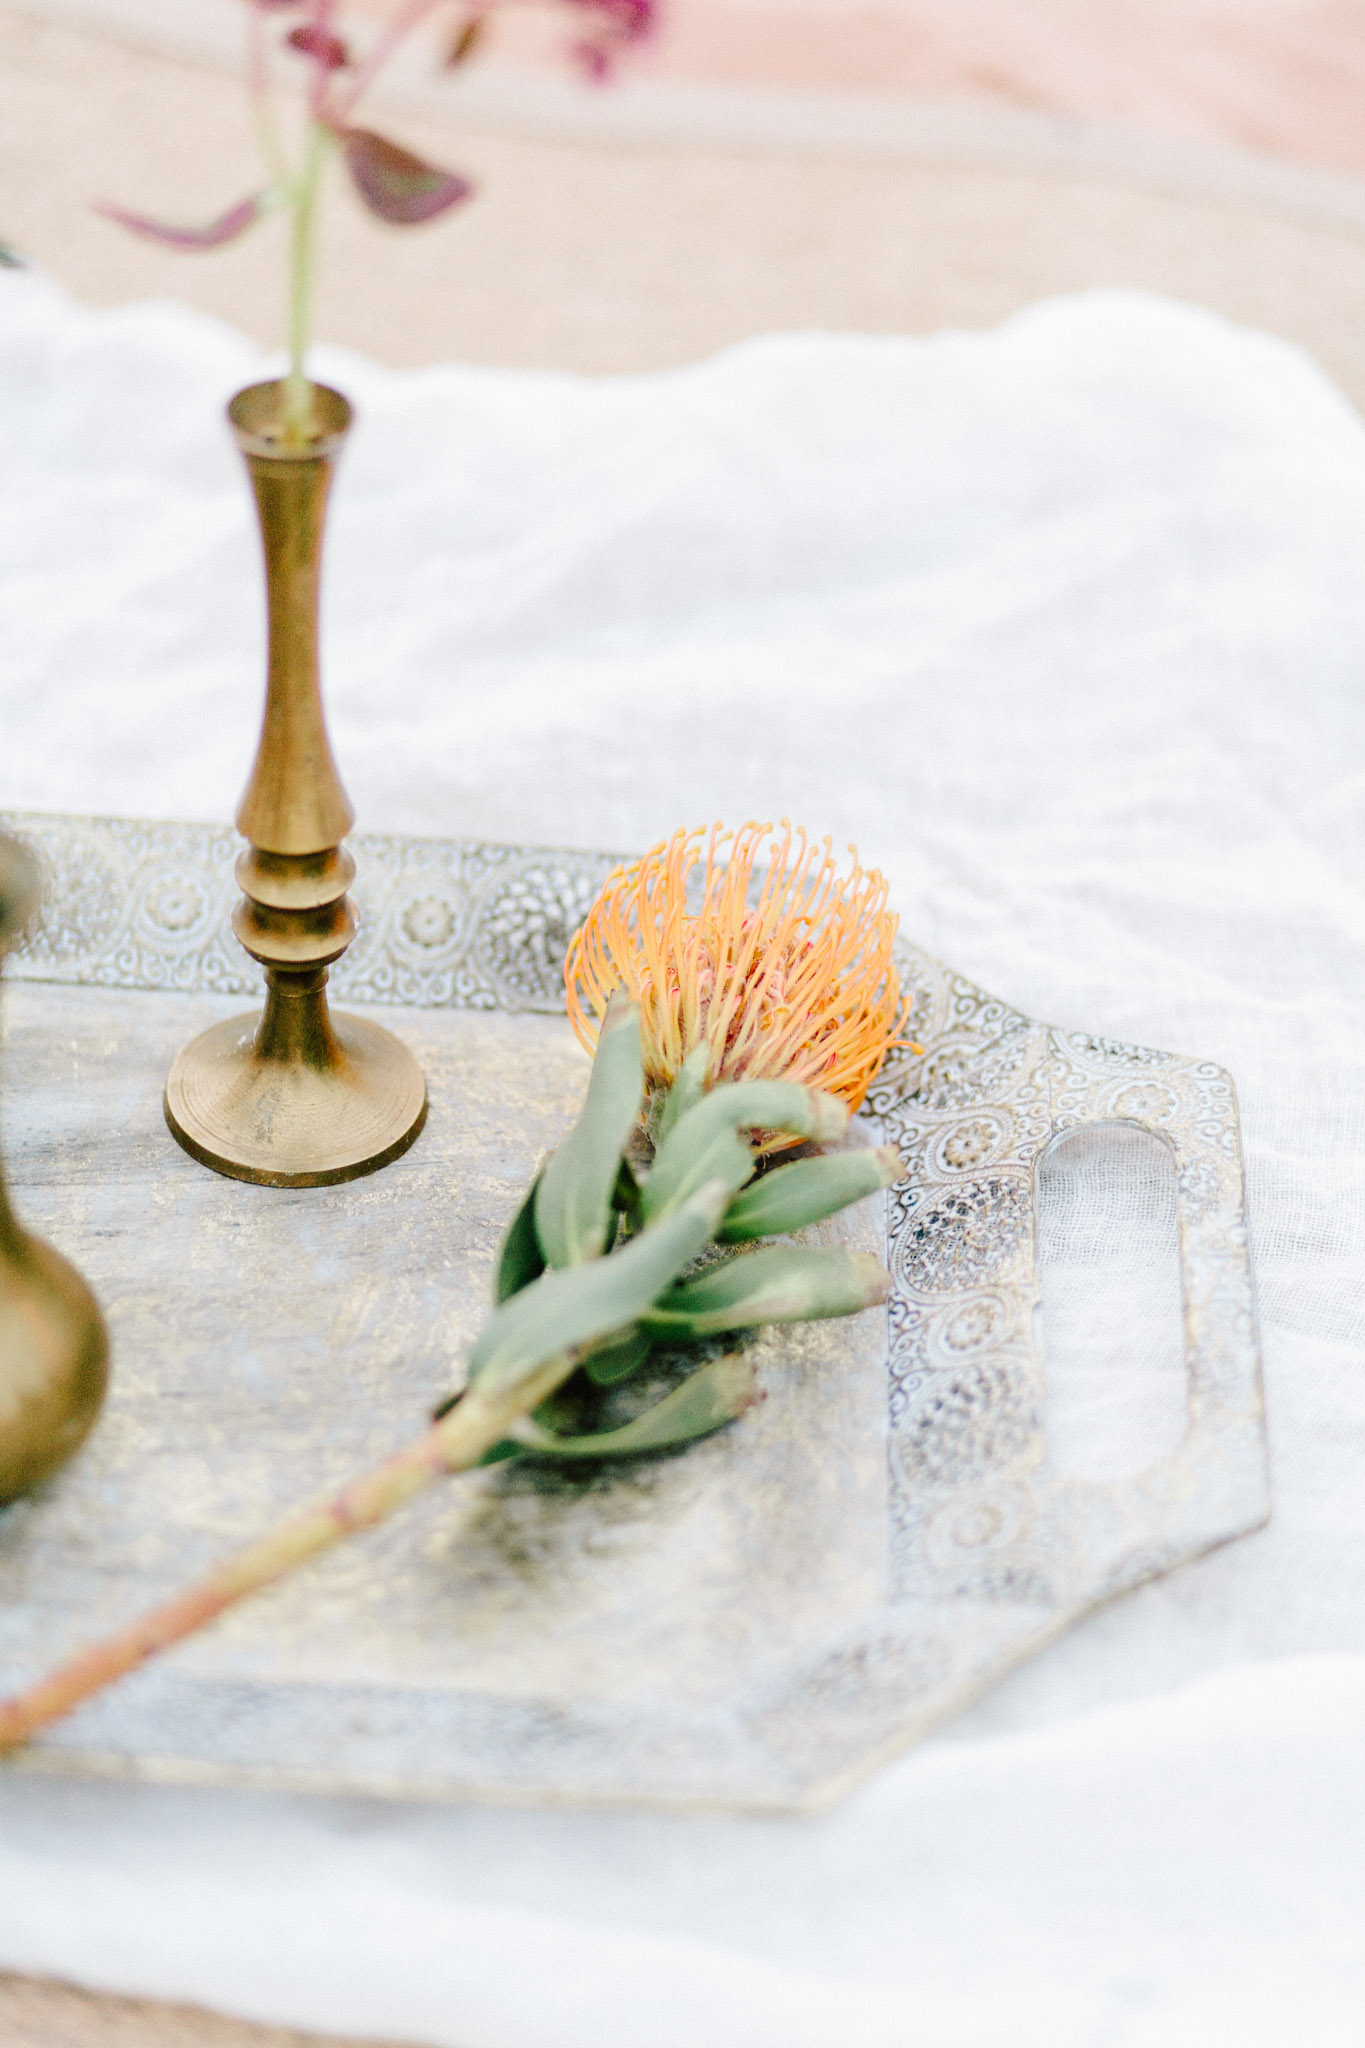 Speyer-Moroccan-Wedding-Inspiration-Pia-Anna-Christian-Wedding-Photography-S-70.jpg